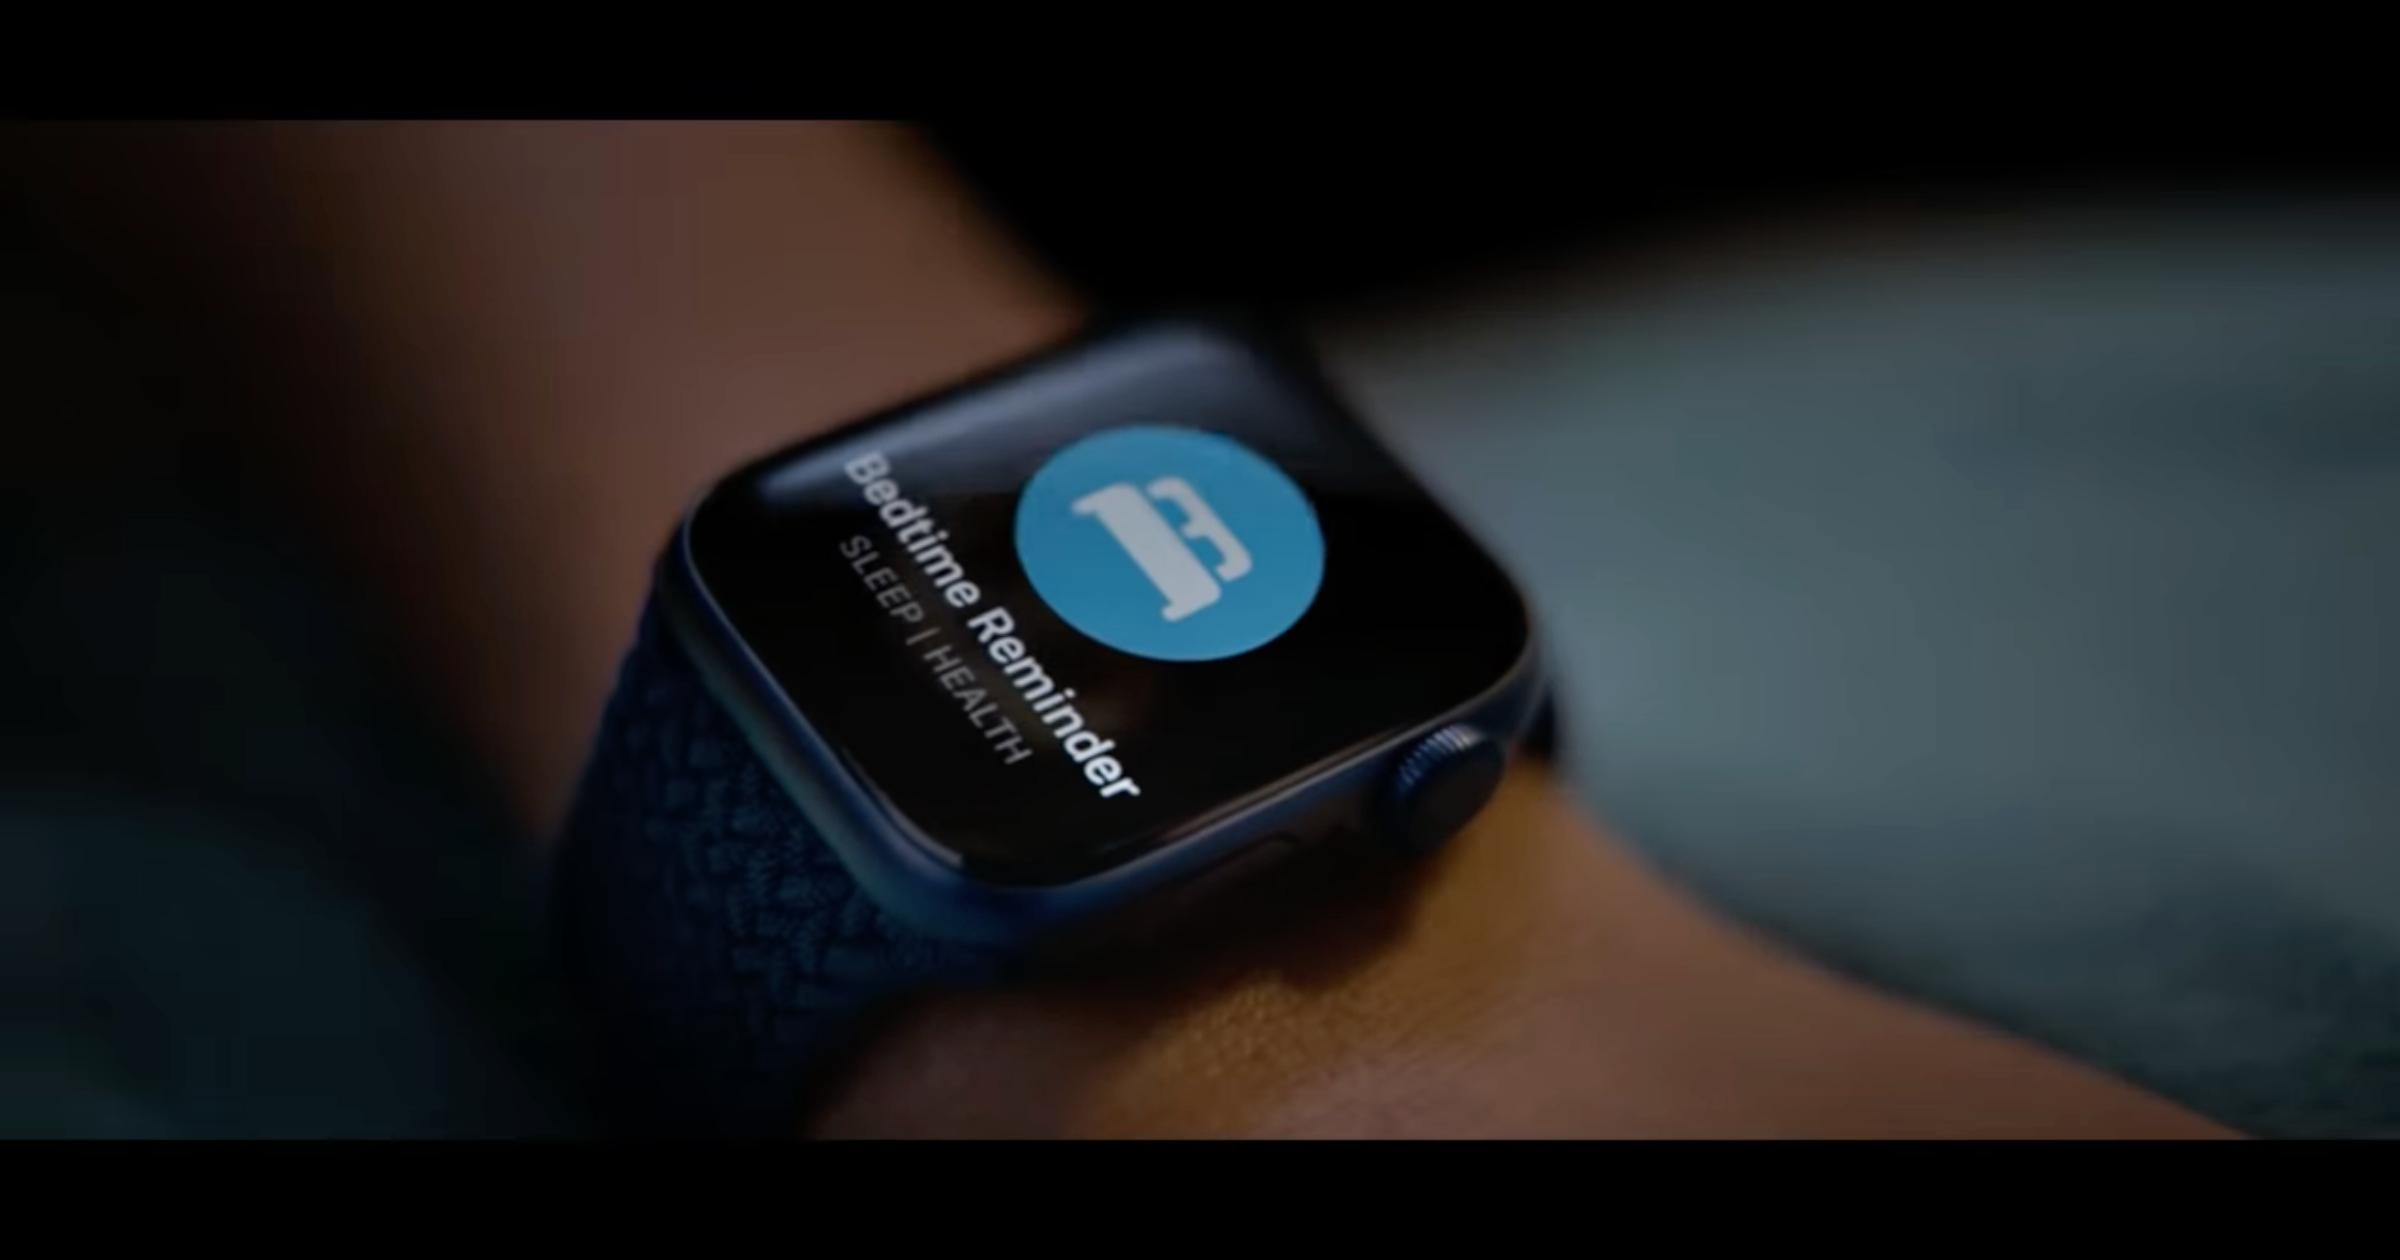 Apple Watch Series 6 Sleep